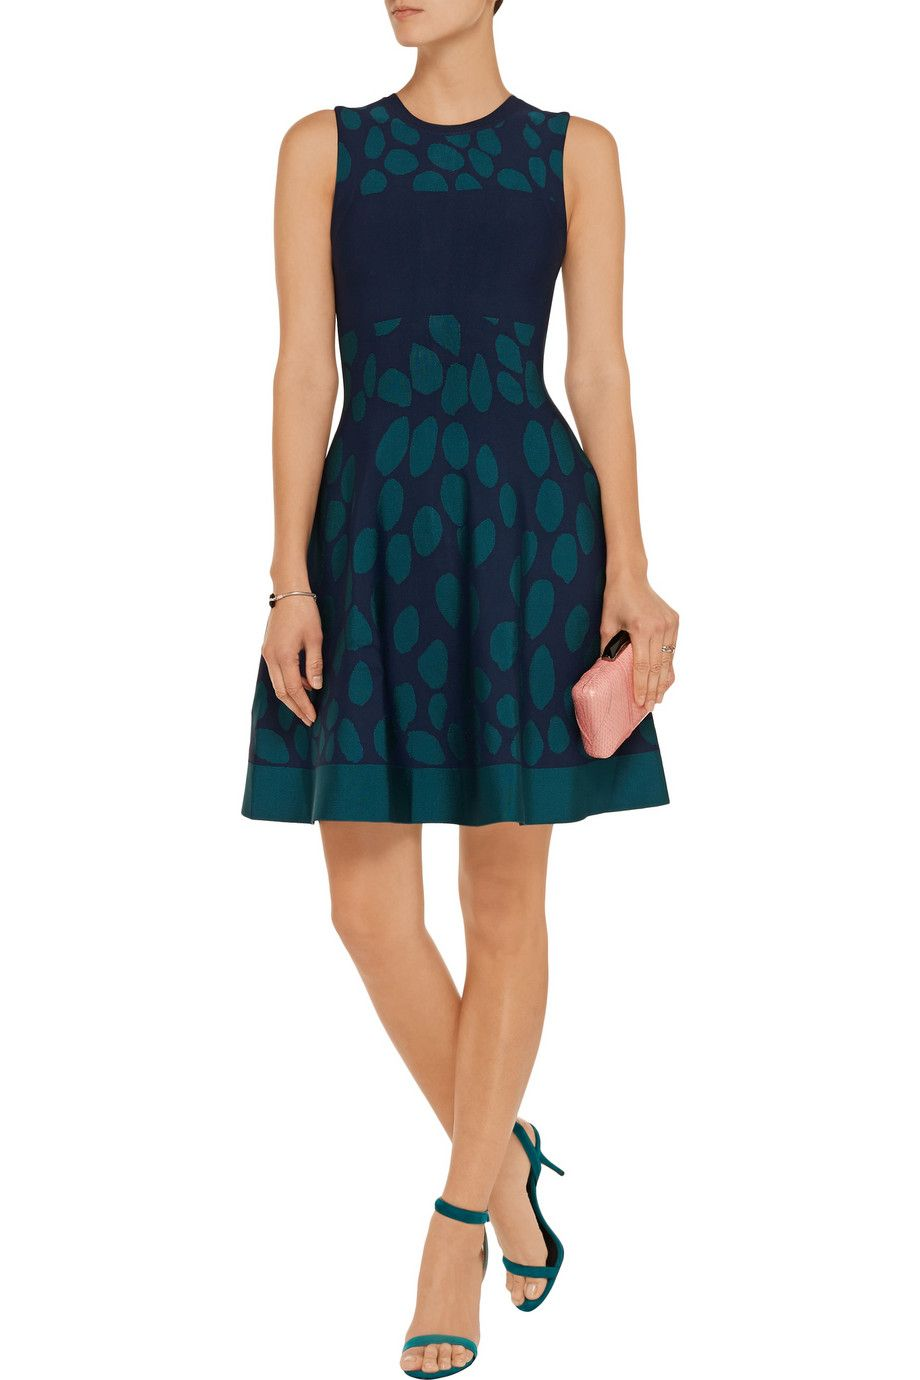 IssaPrinted stretch jacquard-knit dressfront